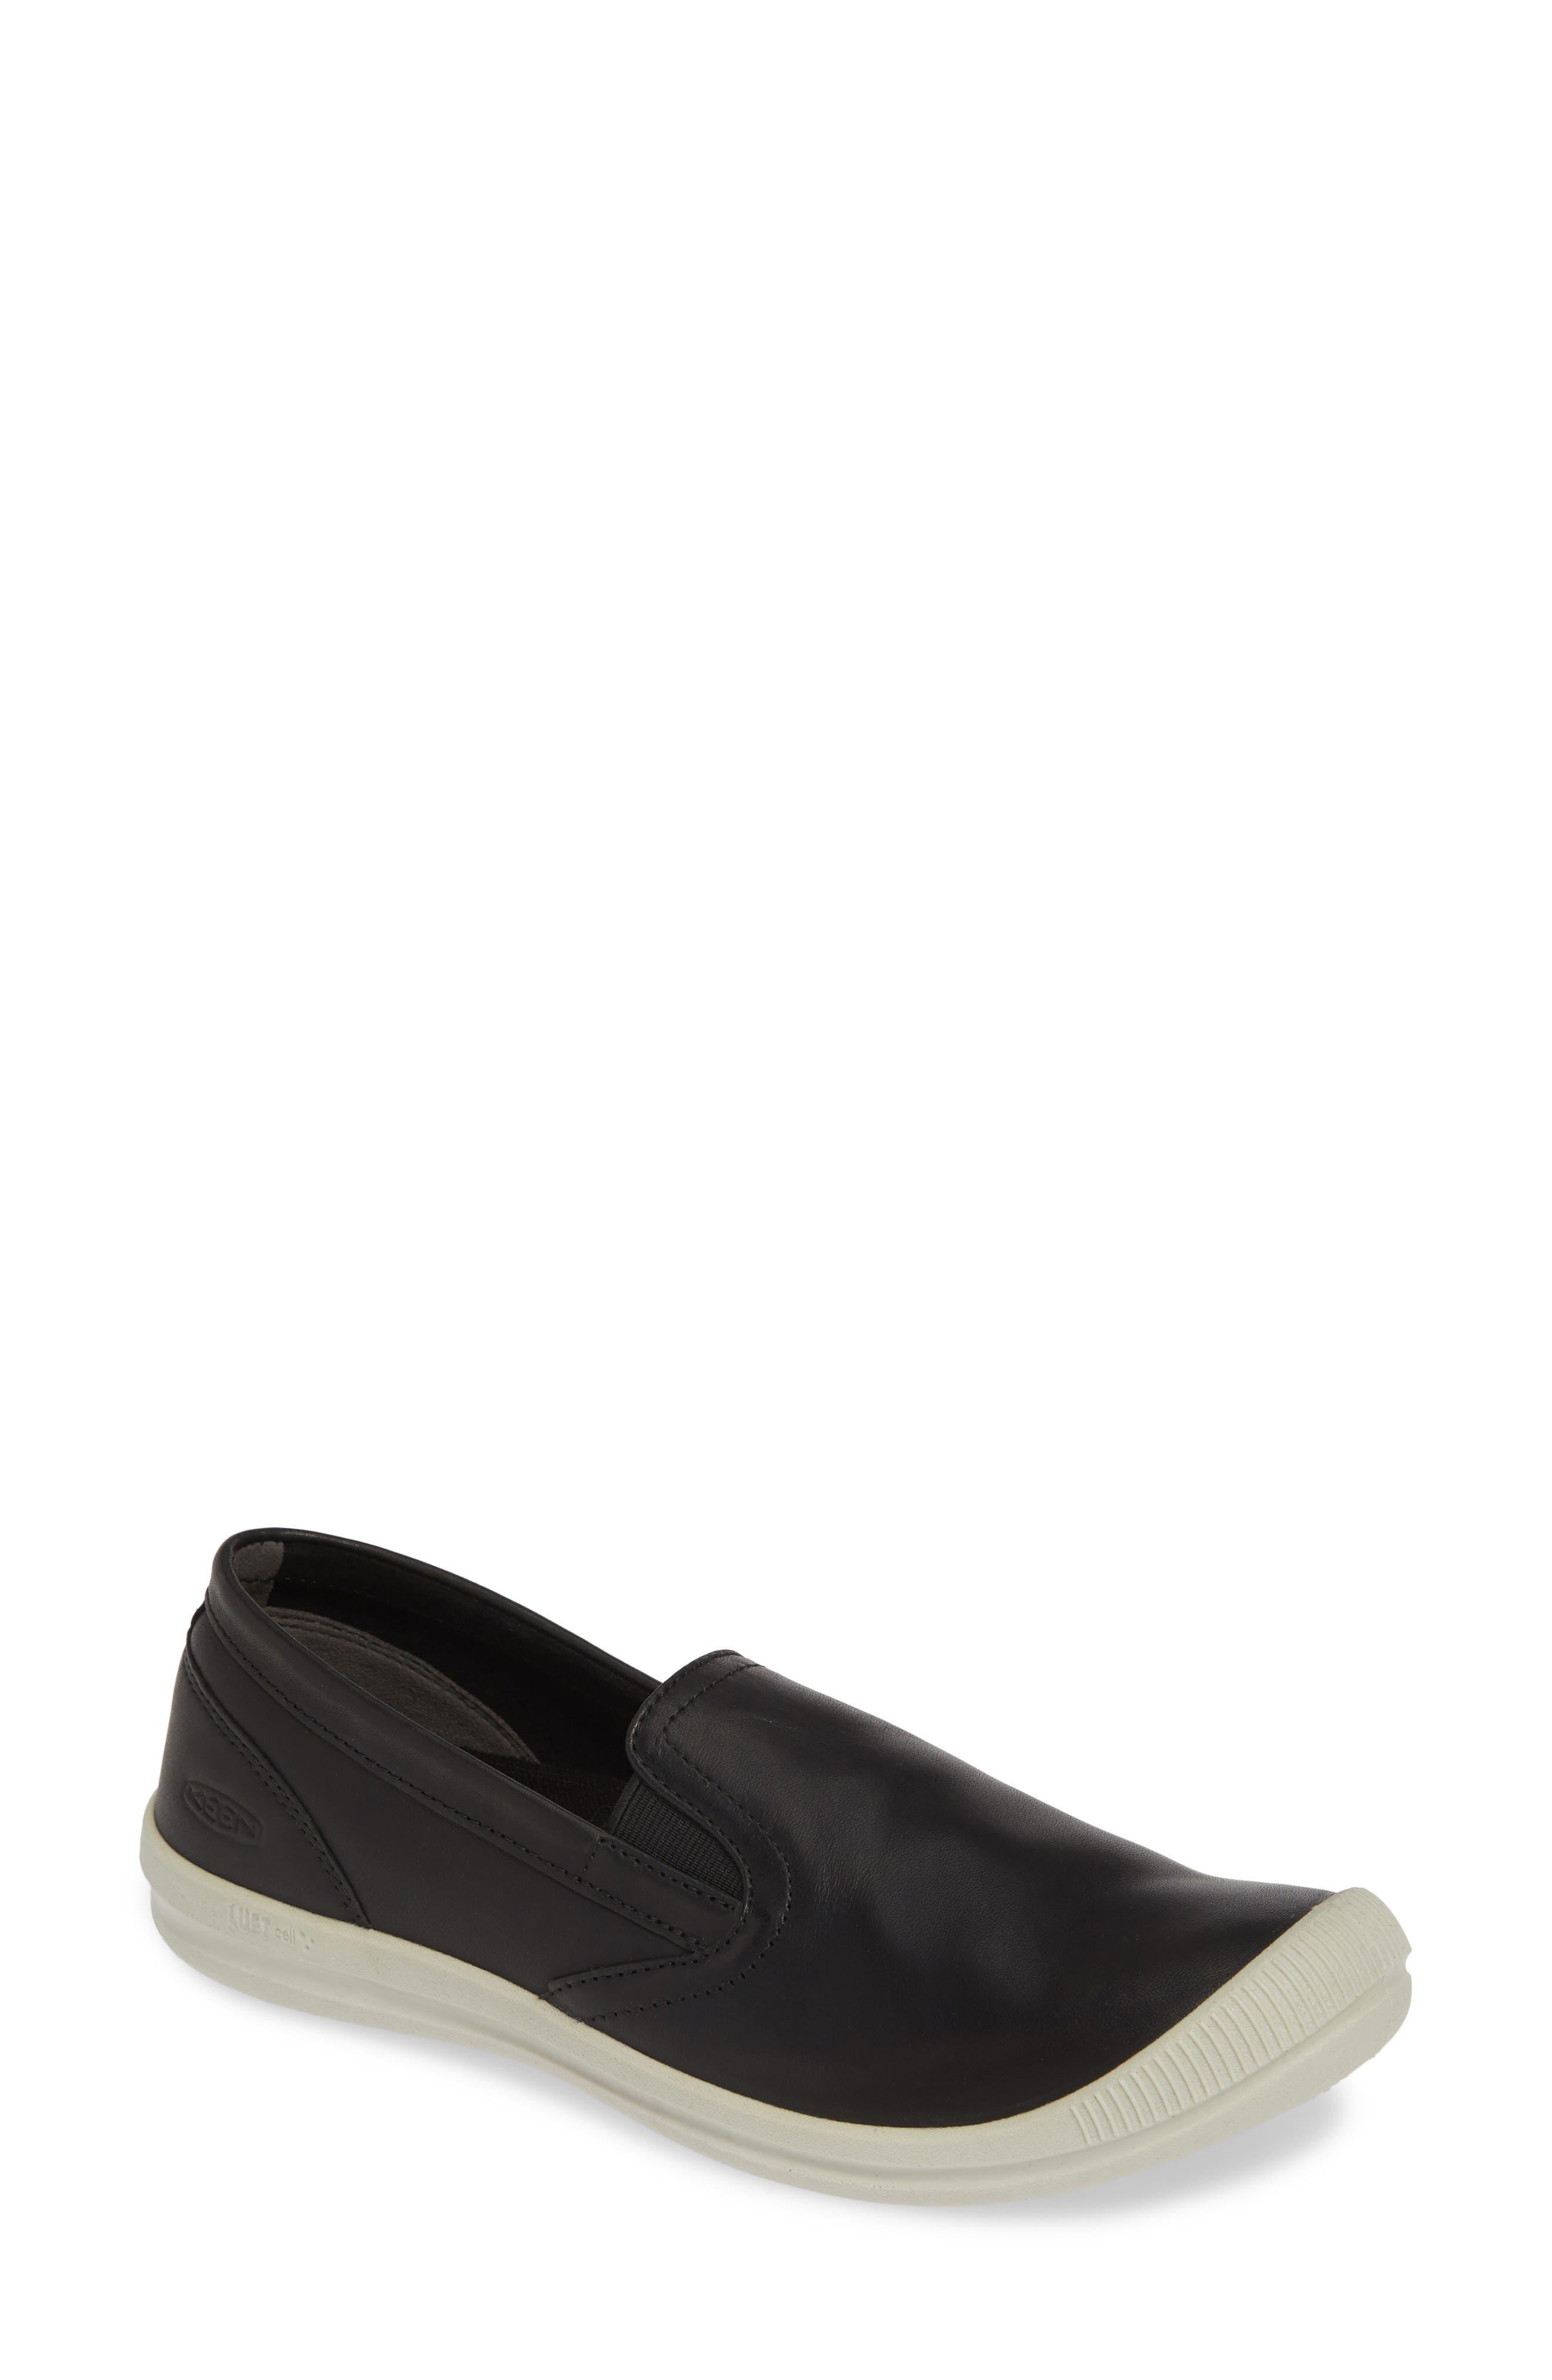 Keen Lorelai Slip-On Sneaker, Black